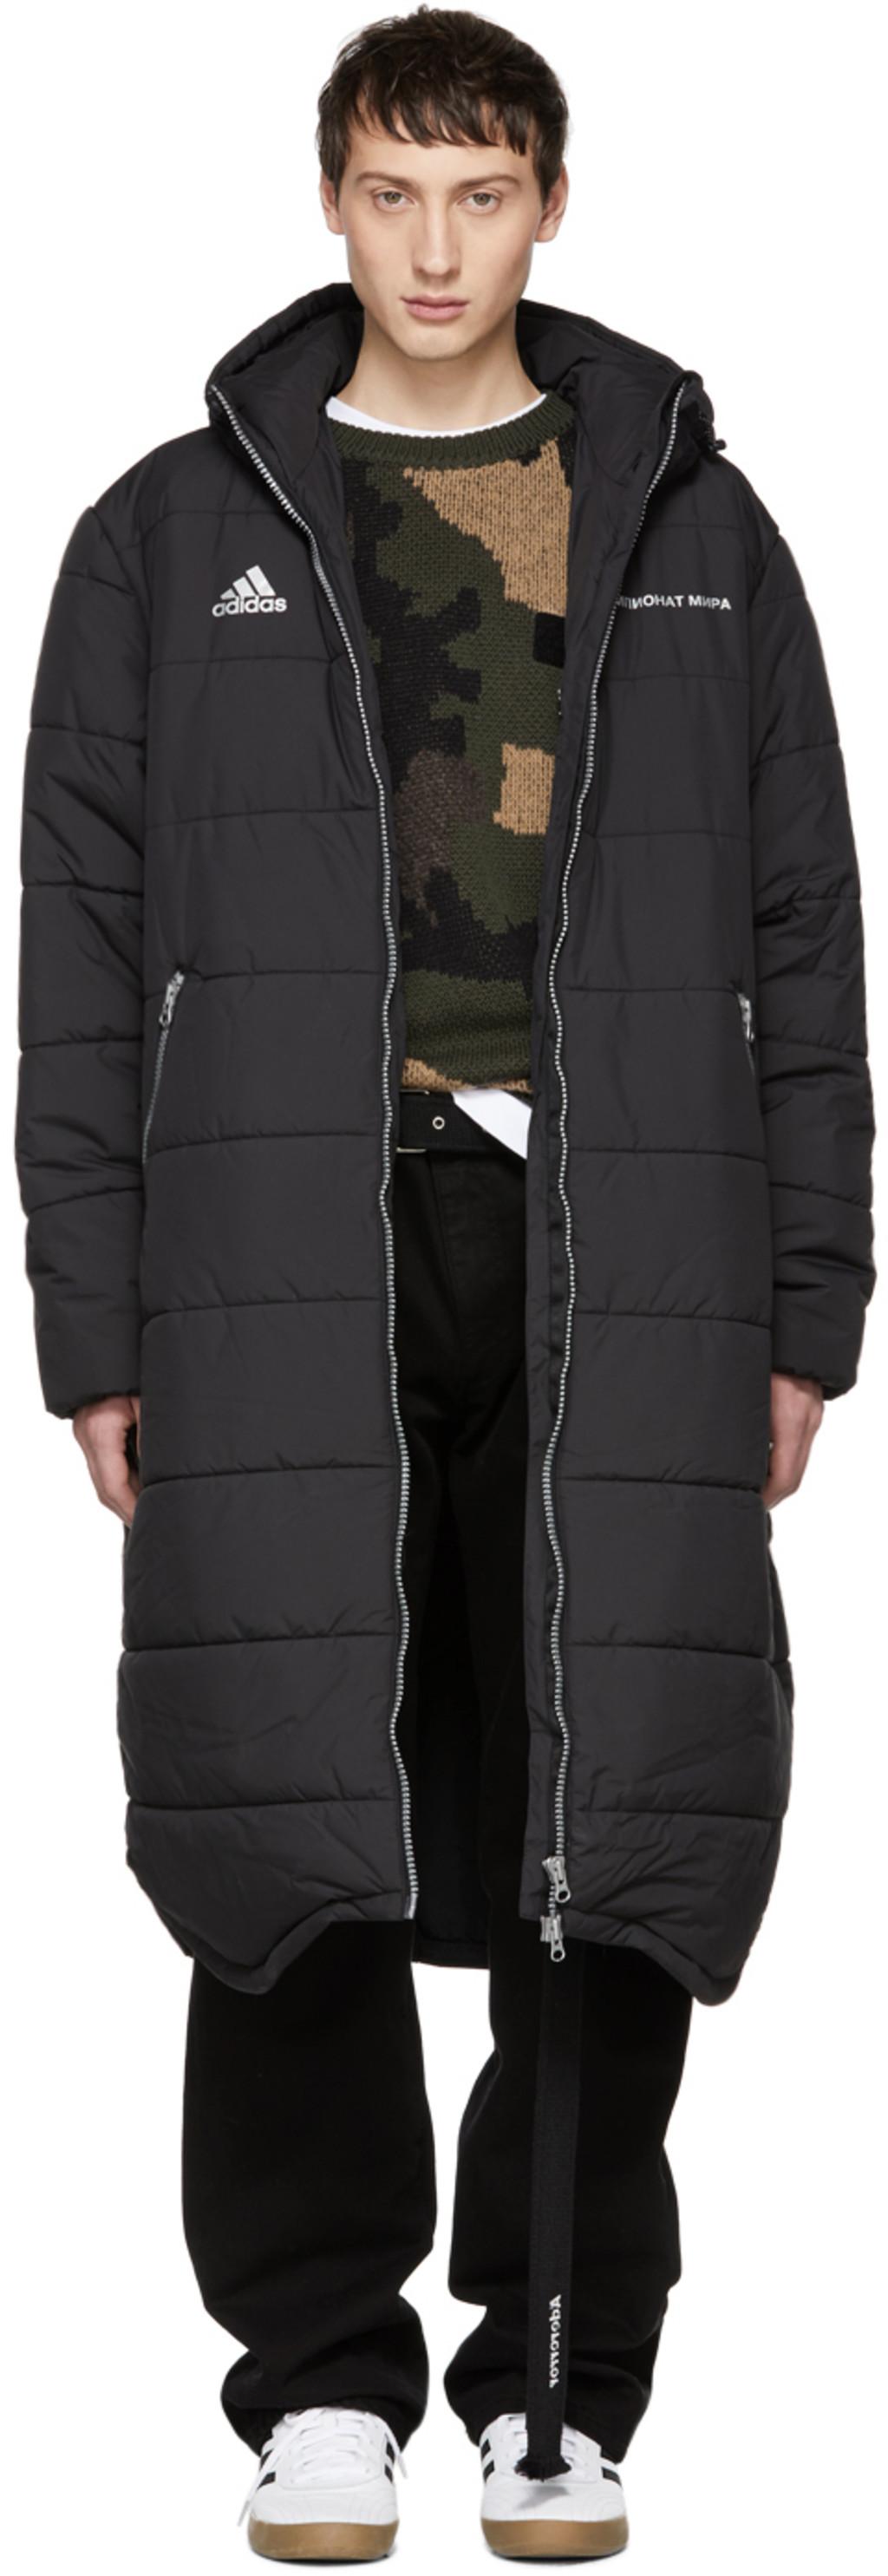 new product 47898 cd75d ... Gosha Rubchinskiy for Men FW18 Collection SSENSE big sale 9e5f4 641c2   Sale adidas Originals ...